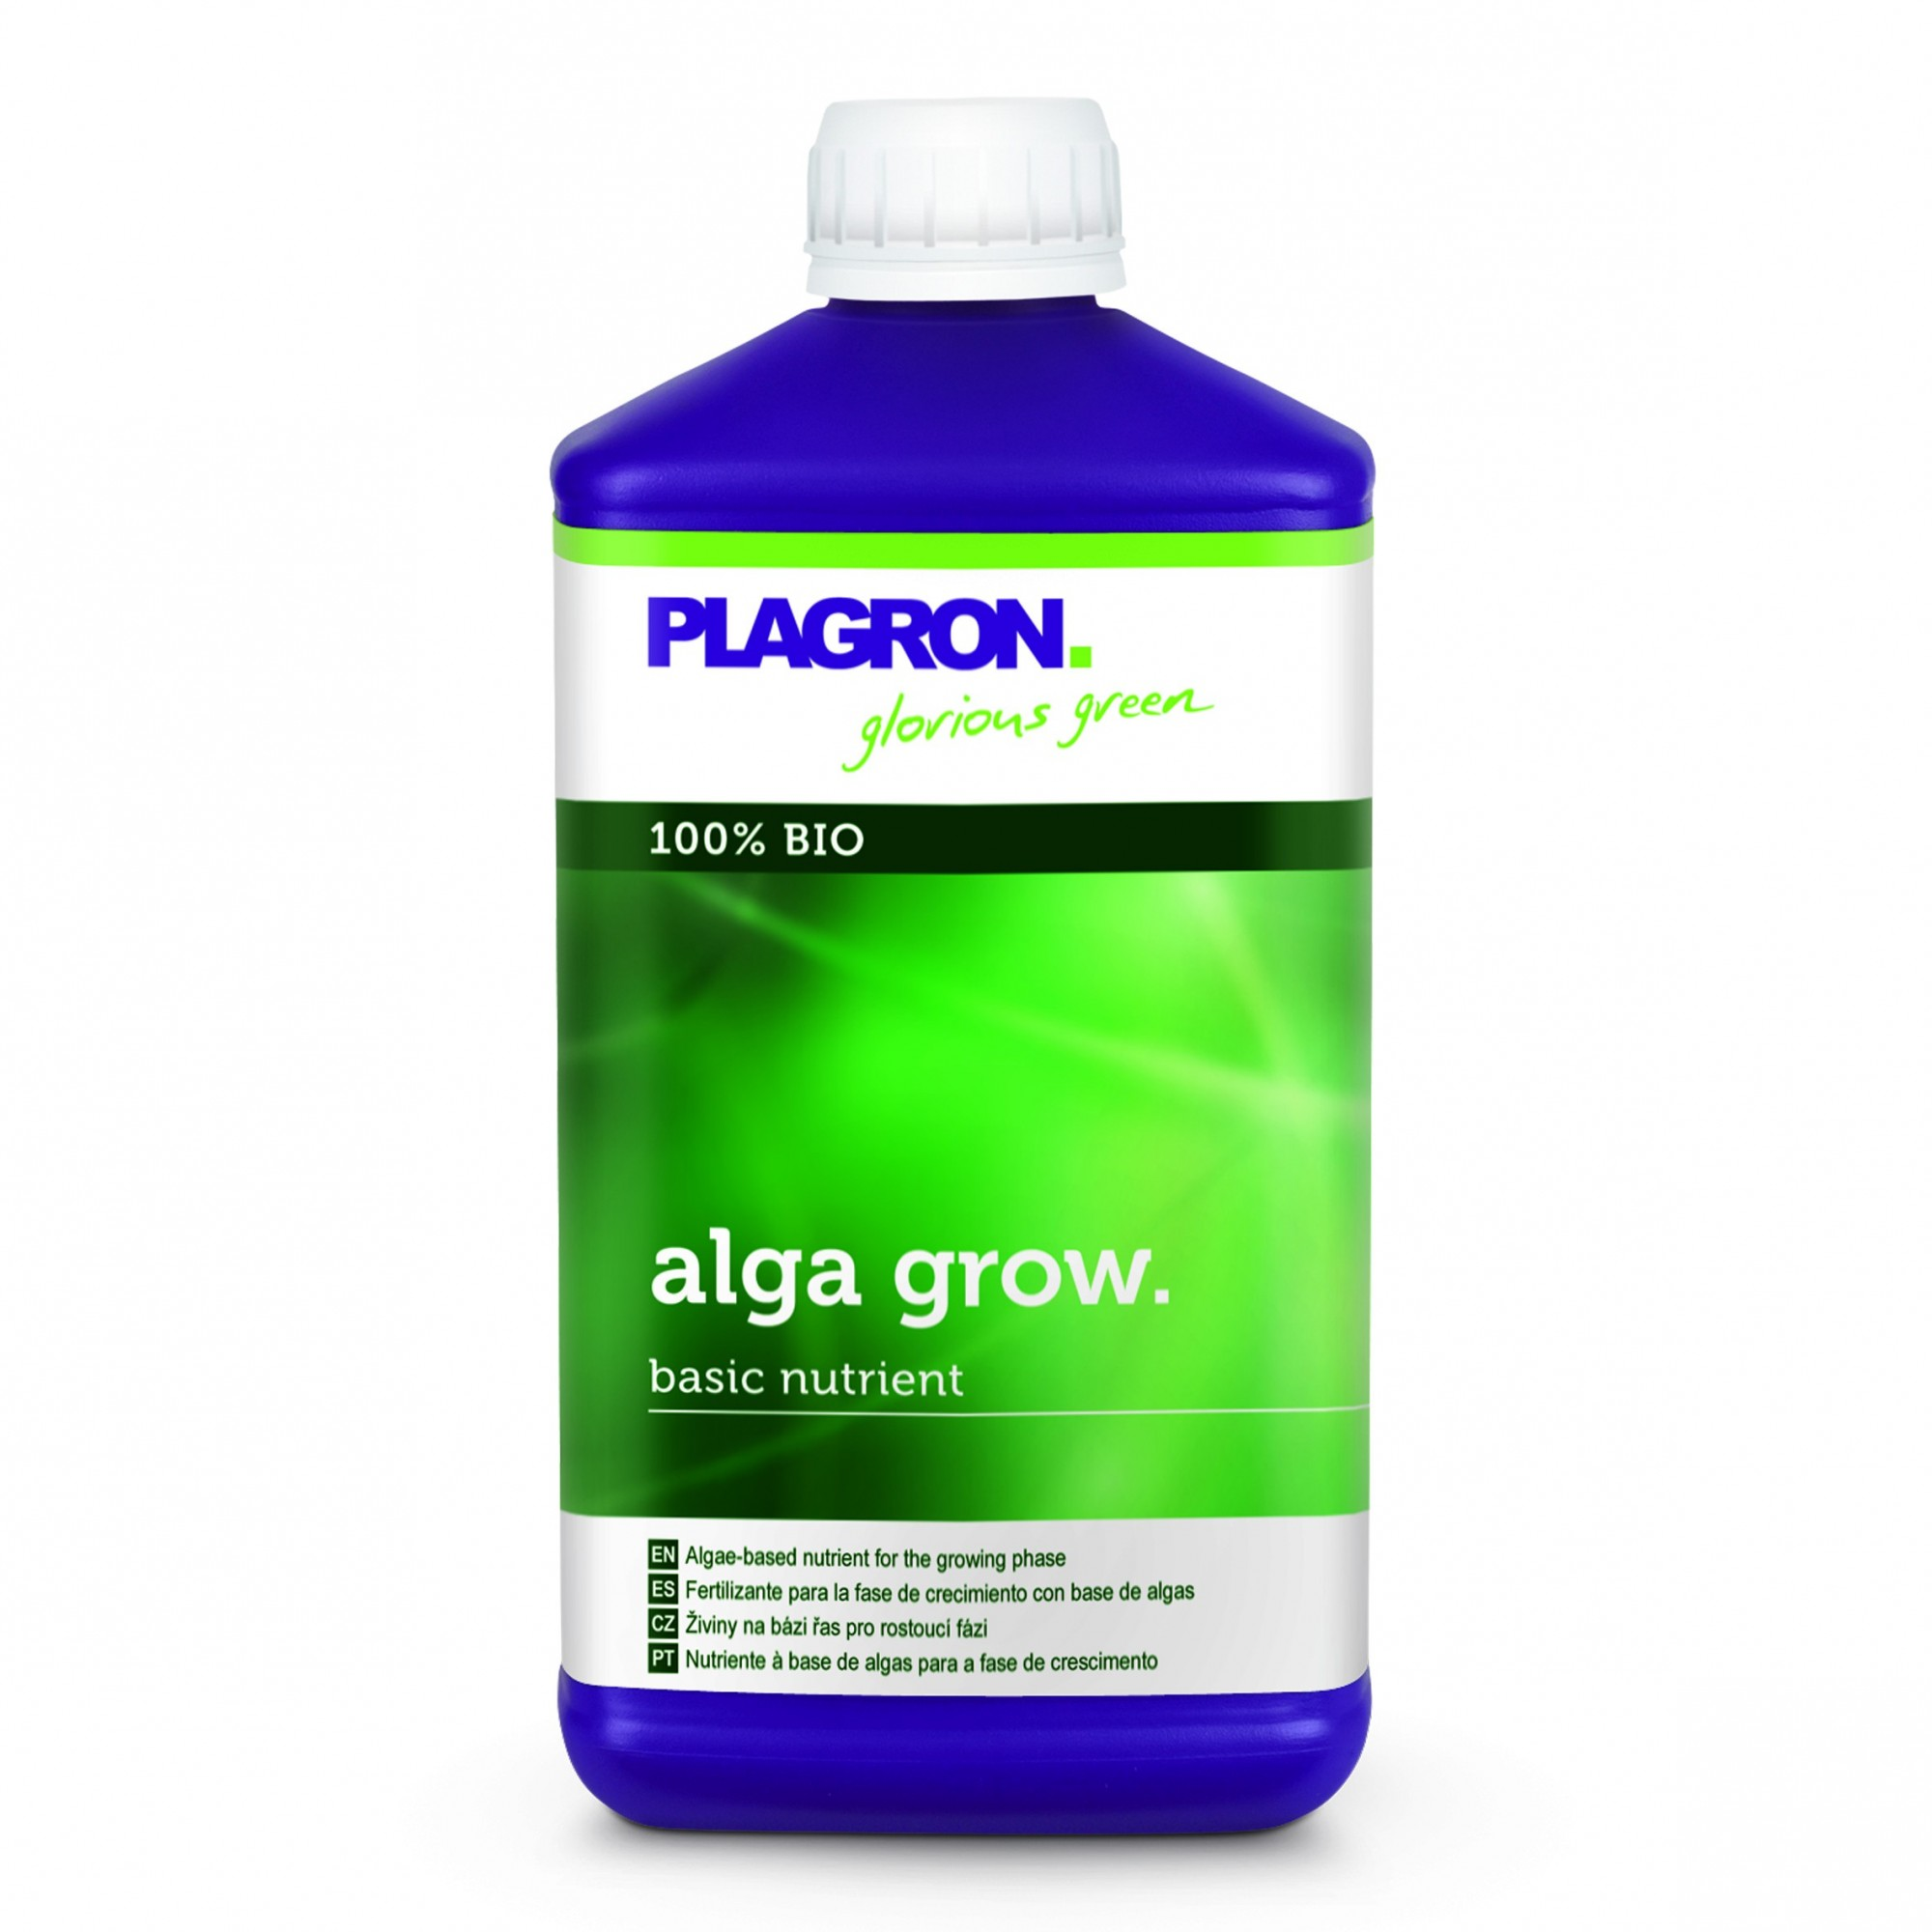 Plagron Alga Grow 0,5 l - růstové hnojivo